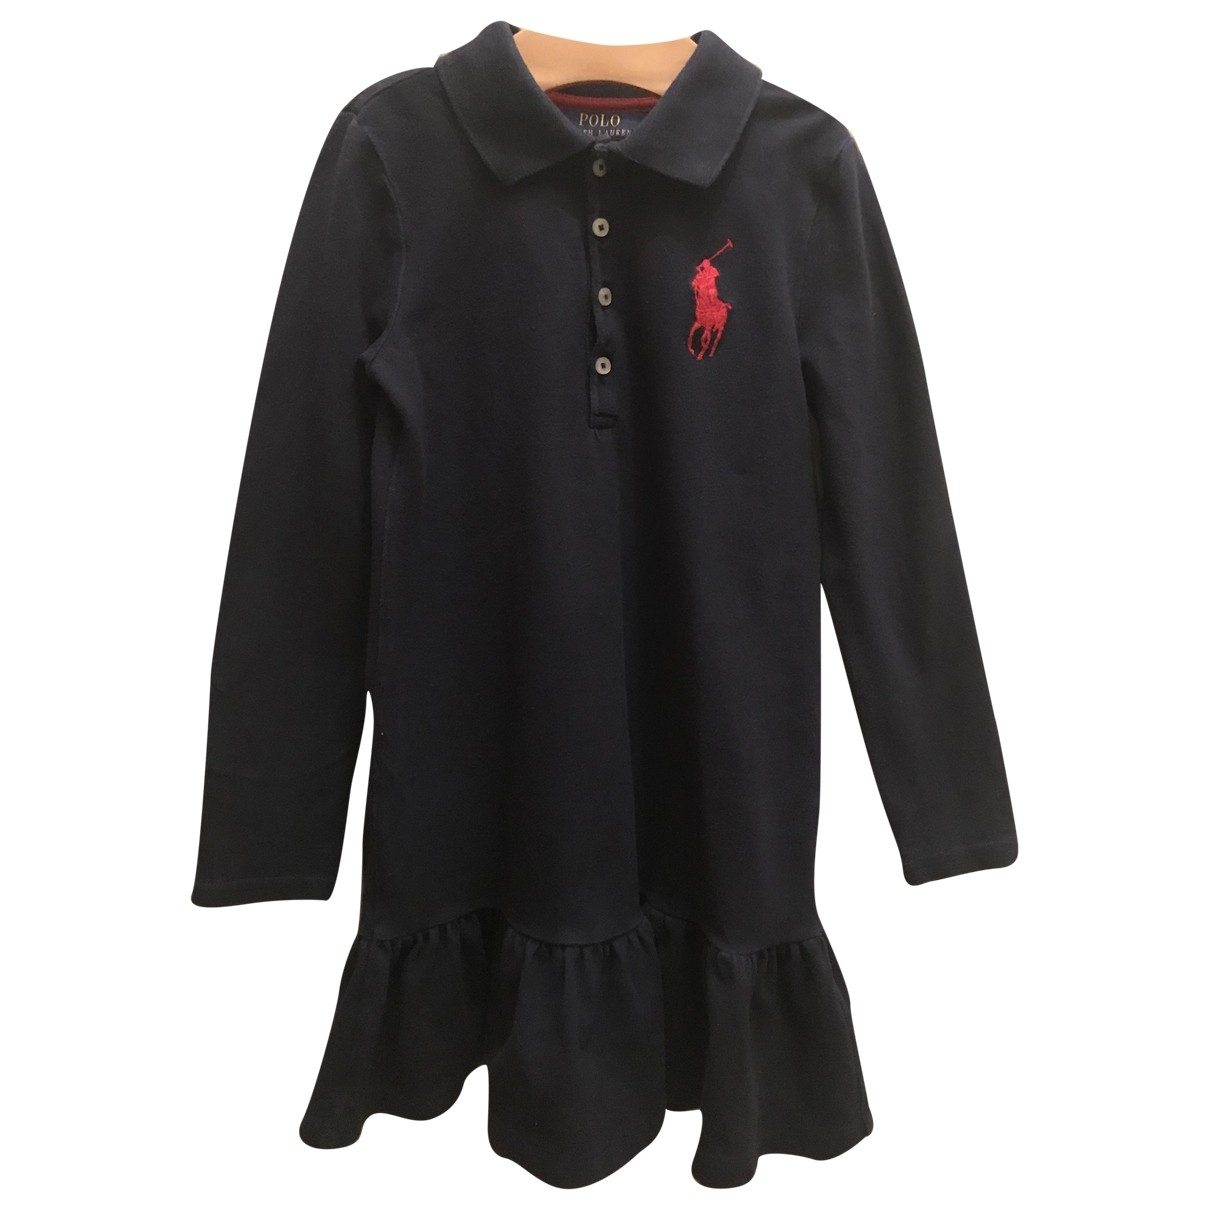 Polo Ralph Lauren - Robe    pour enfant en coton - elasthane - bleu